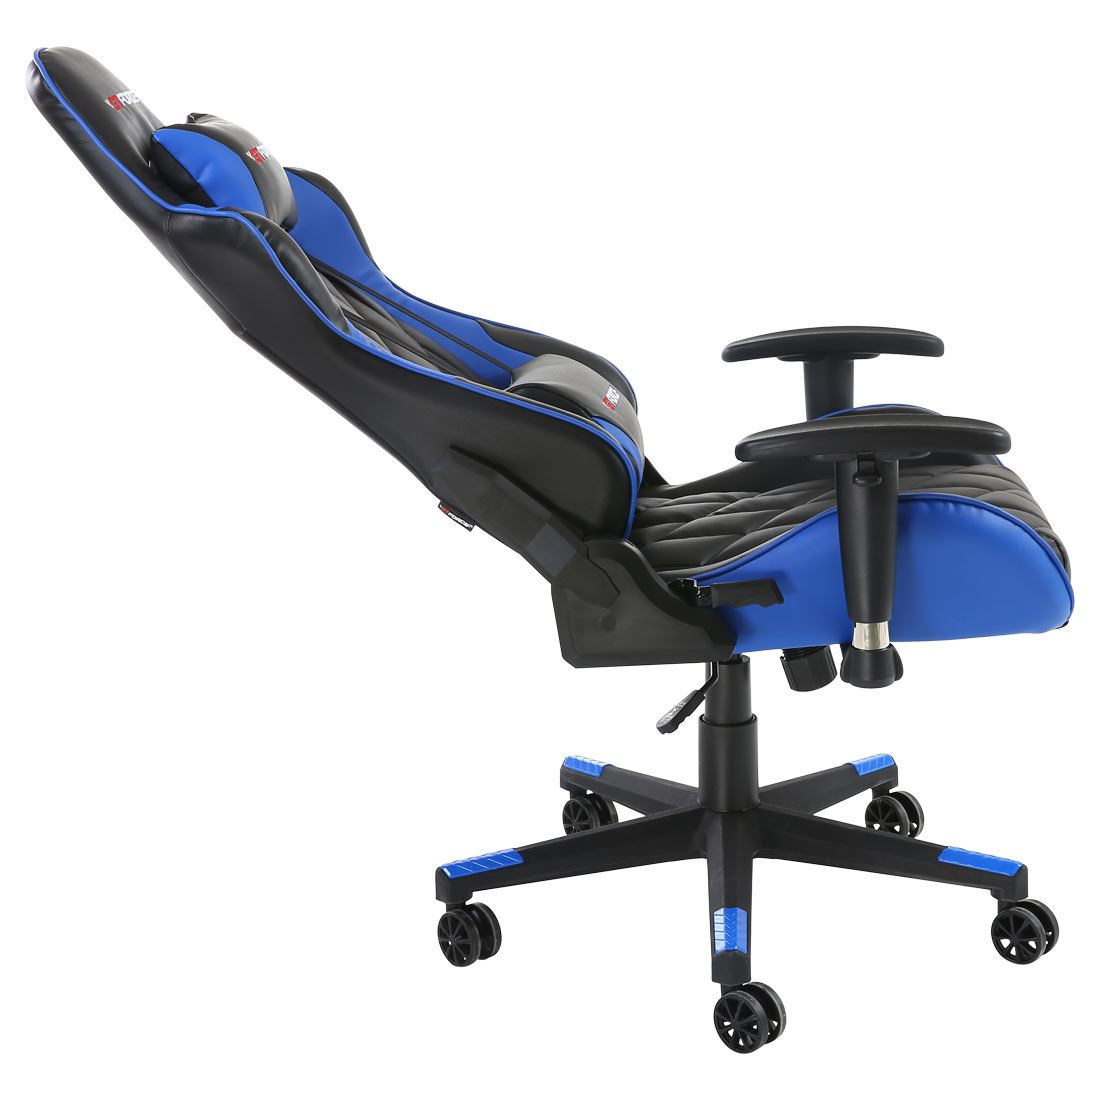 Home, Furniture & DIY > Furniture > Chairs